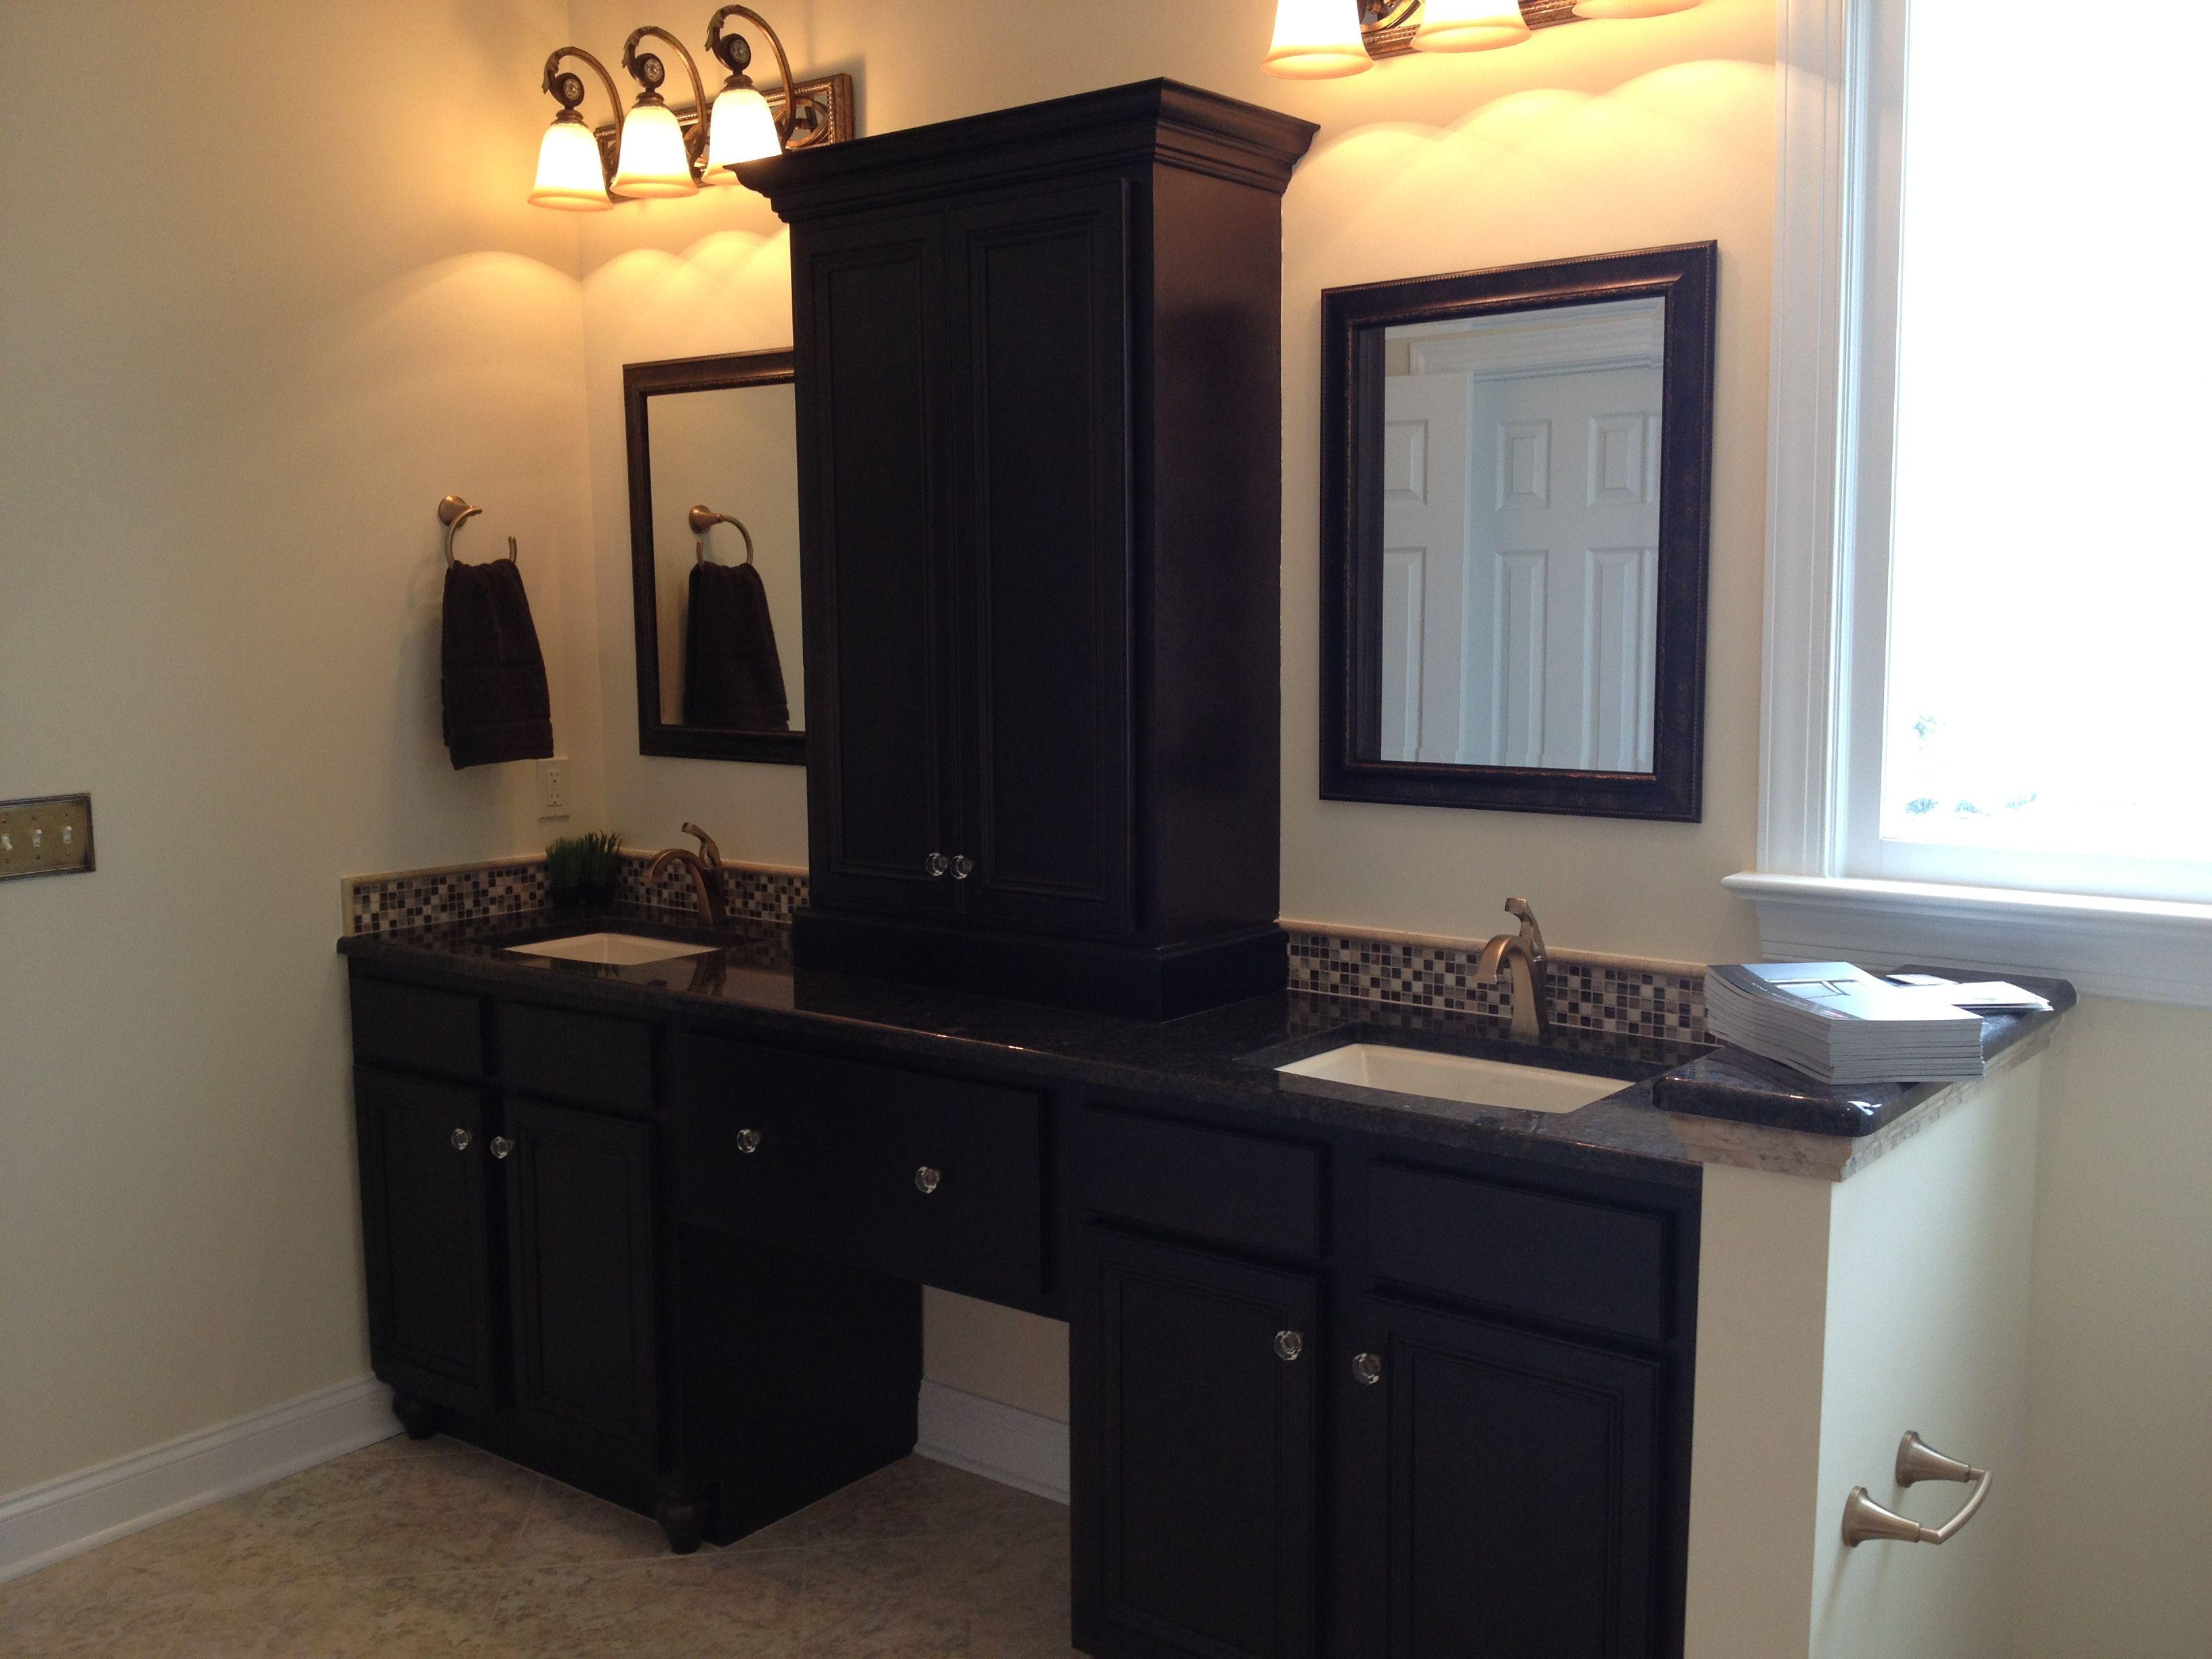 Bathroom Design Gallery in Greensboro - Distinctive ...